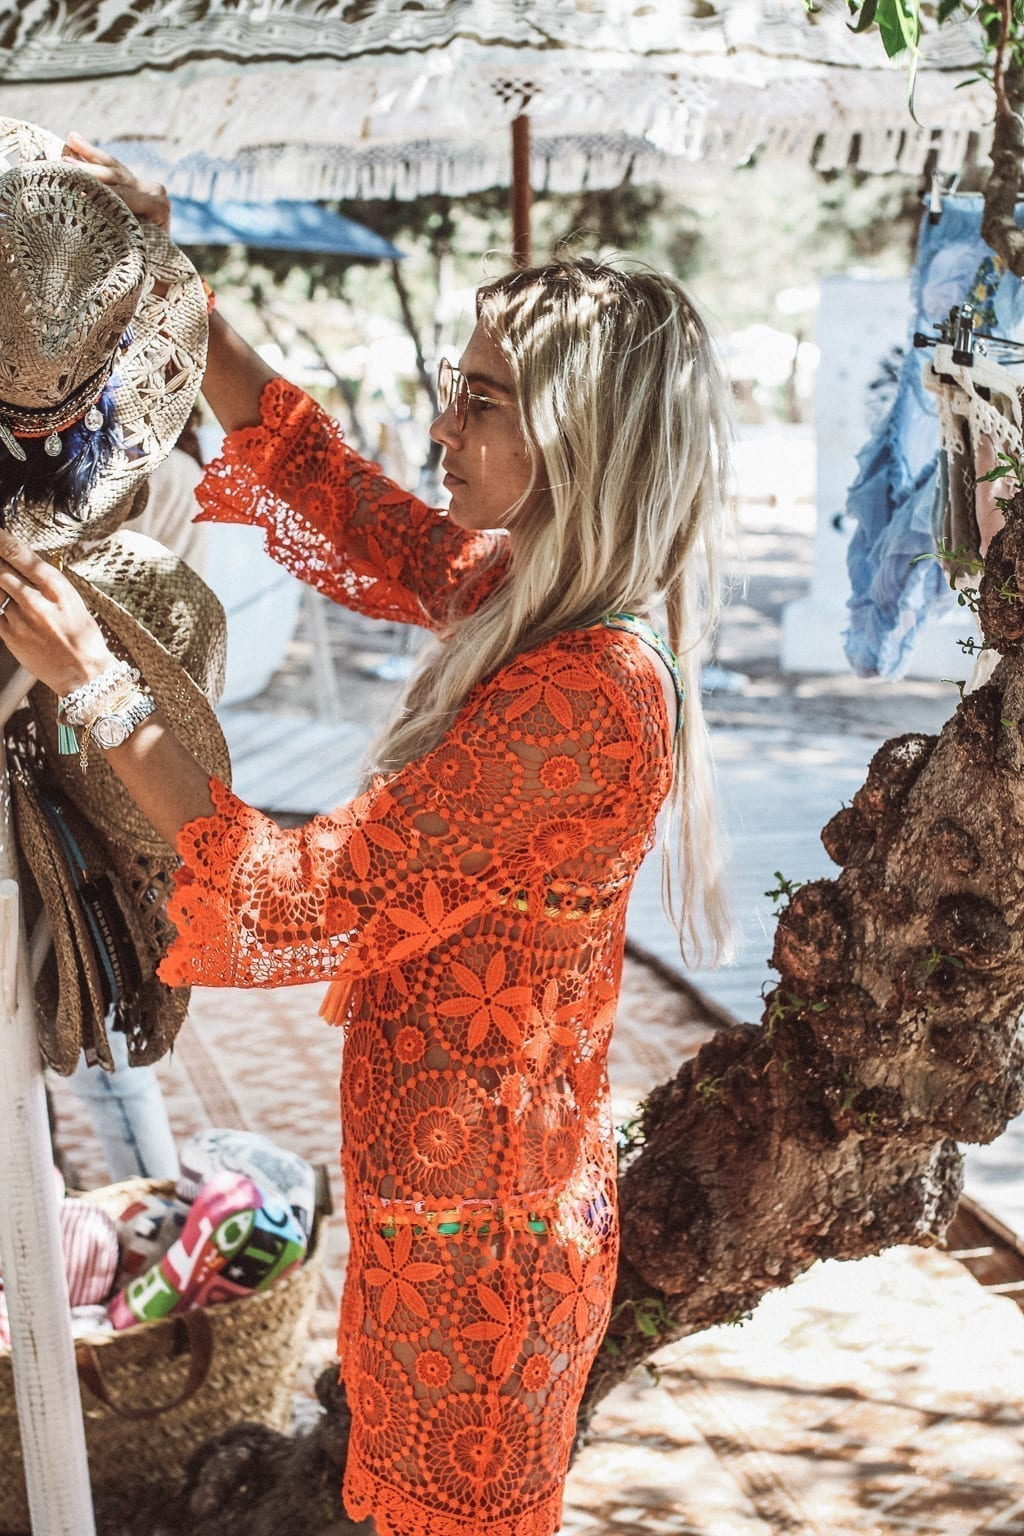 CK1603_Constantly-K-Karin-Kaswurm-Ibiza-Beach-Hippie-Boho-Style-Blog-7932